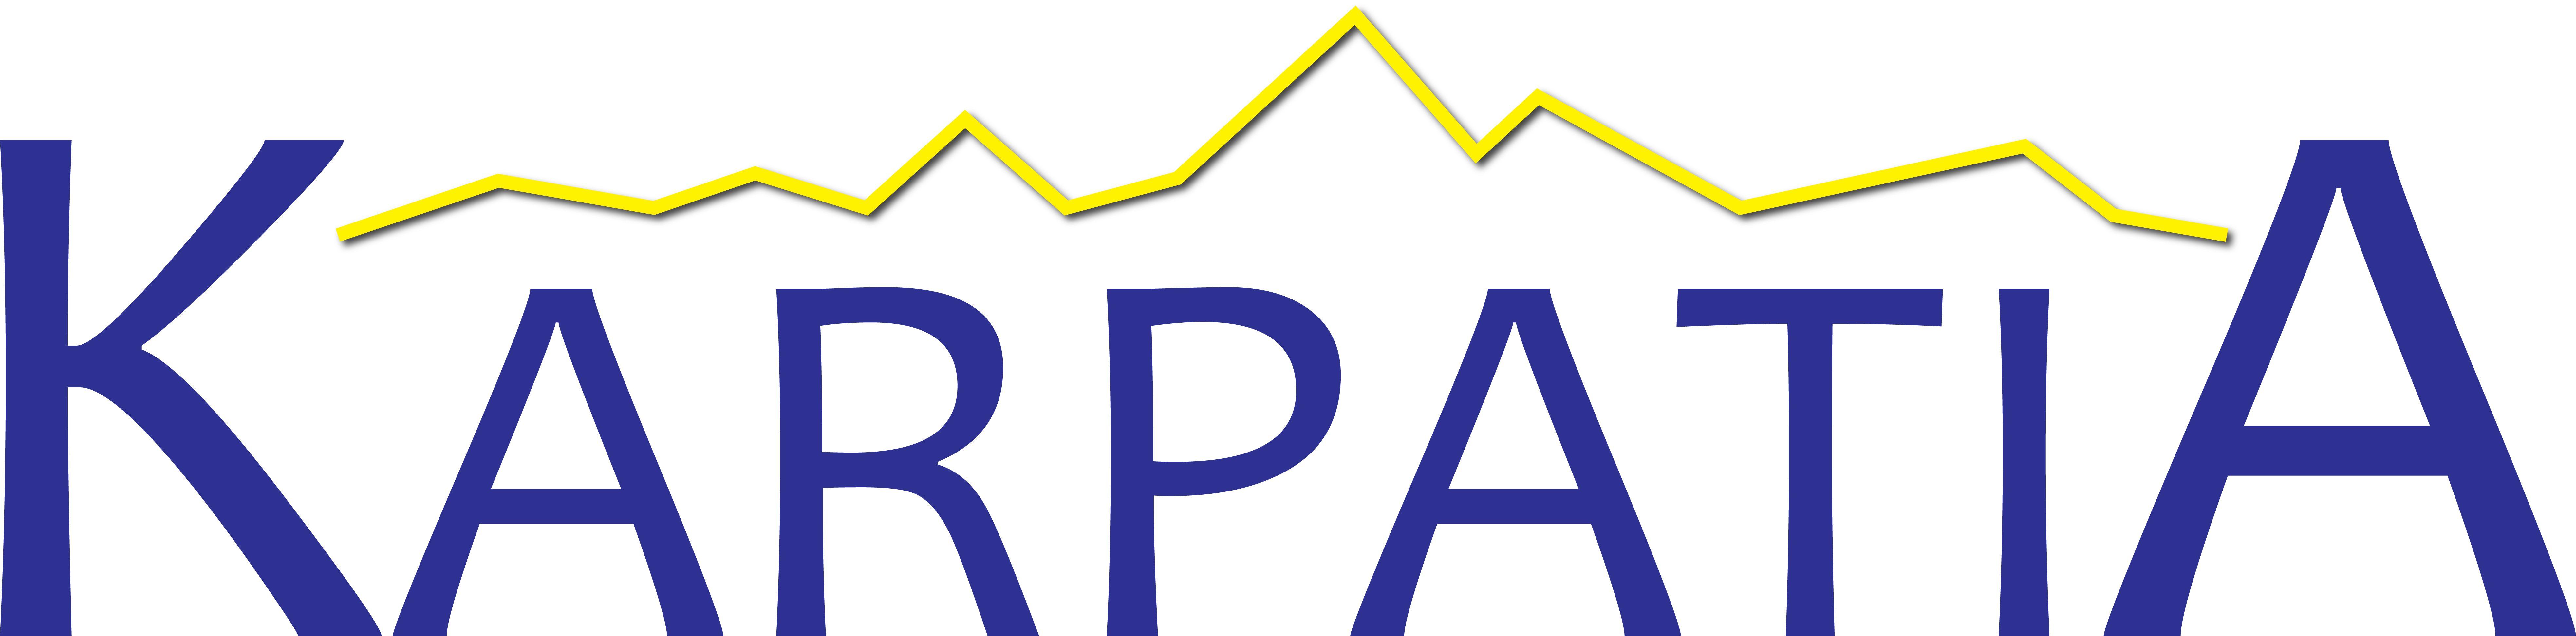 KARPATIA_logo